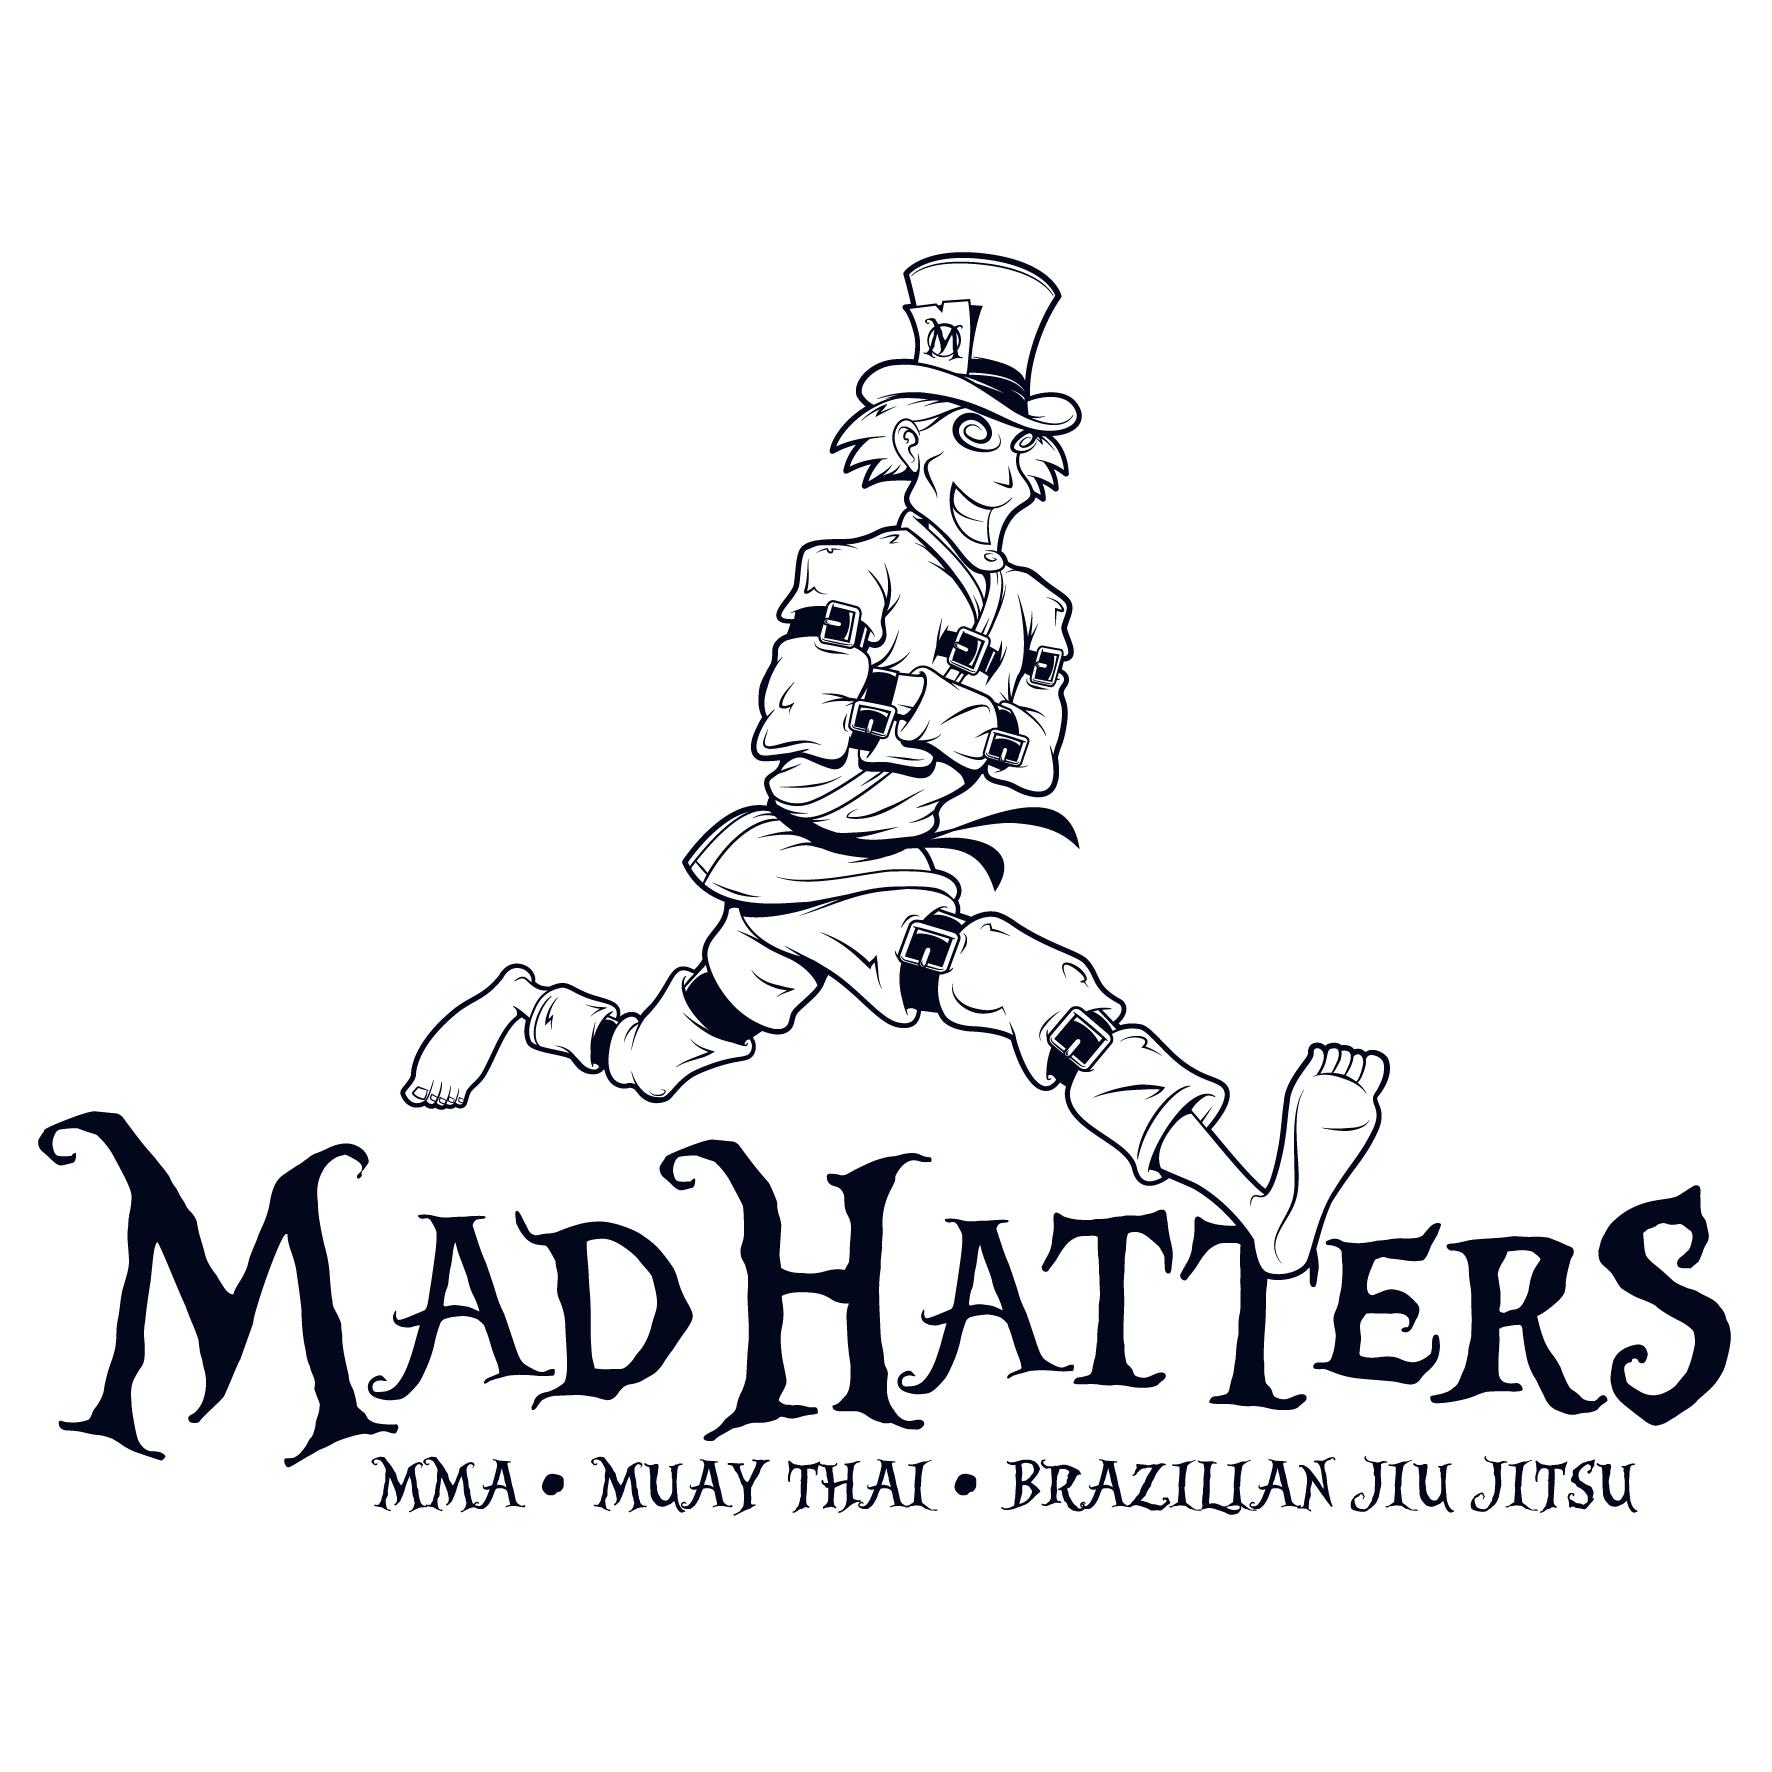 Mad Hatters Logo 6.jpg